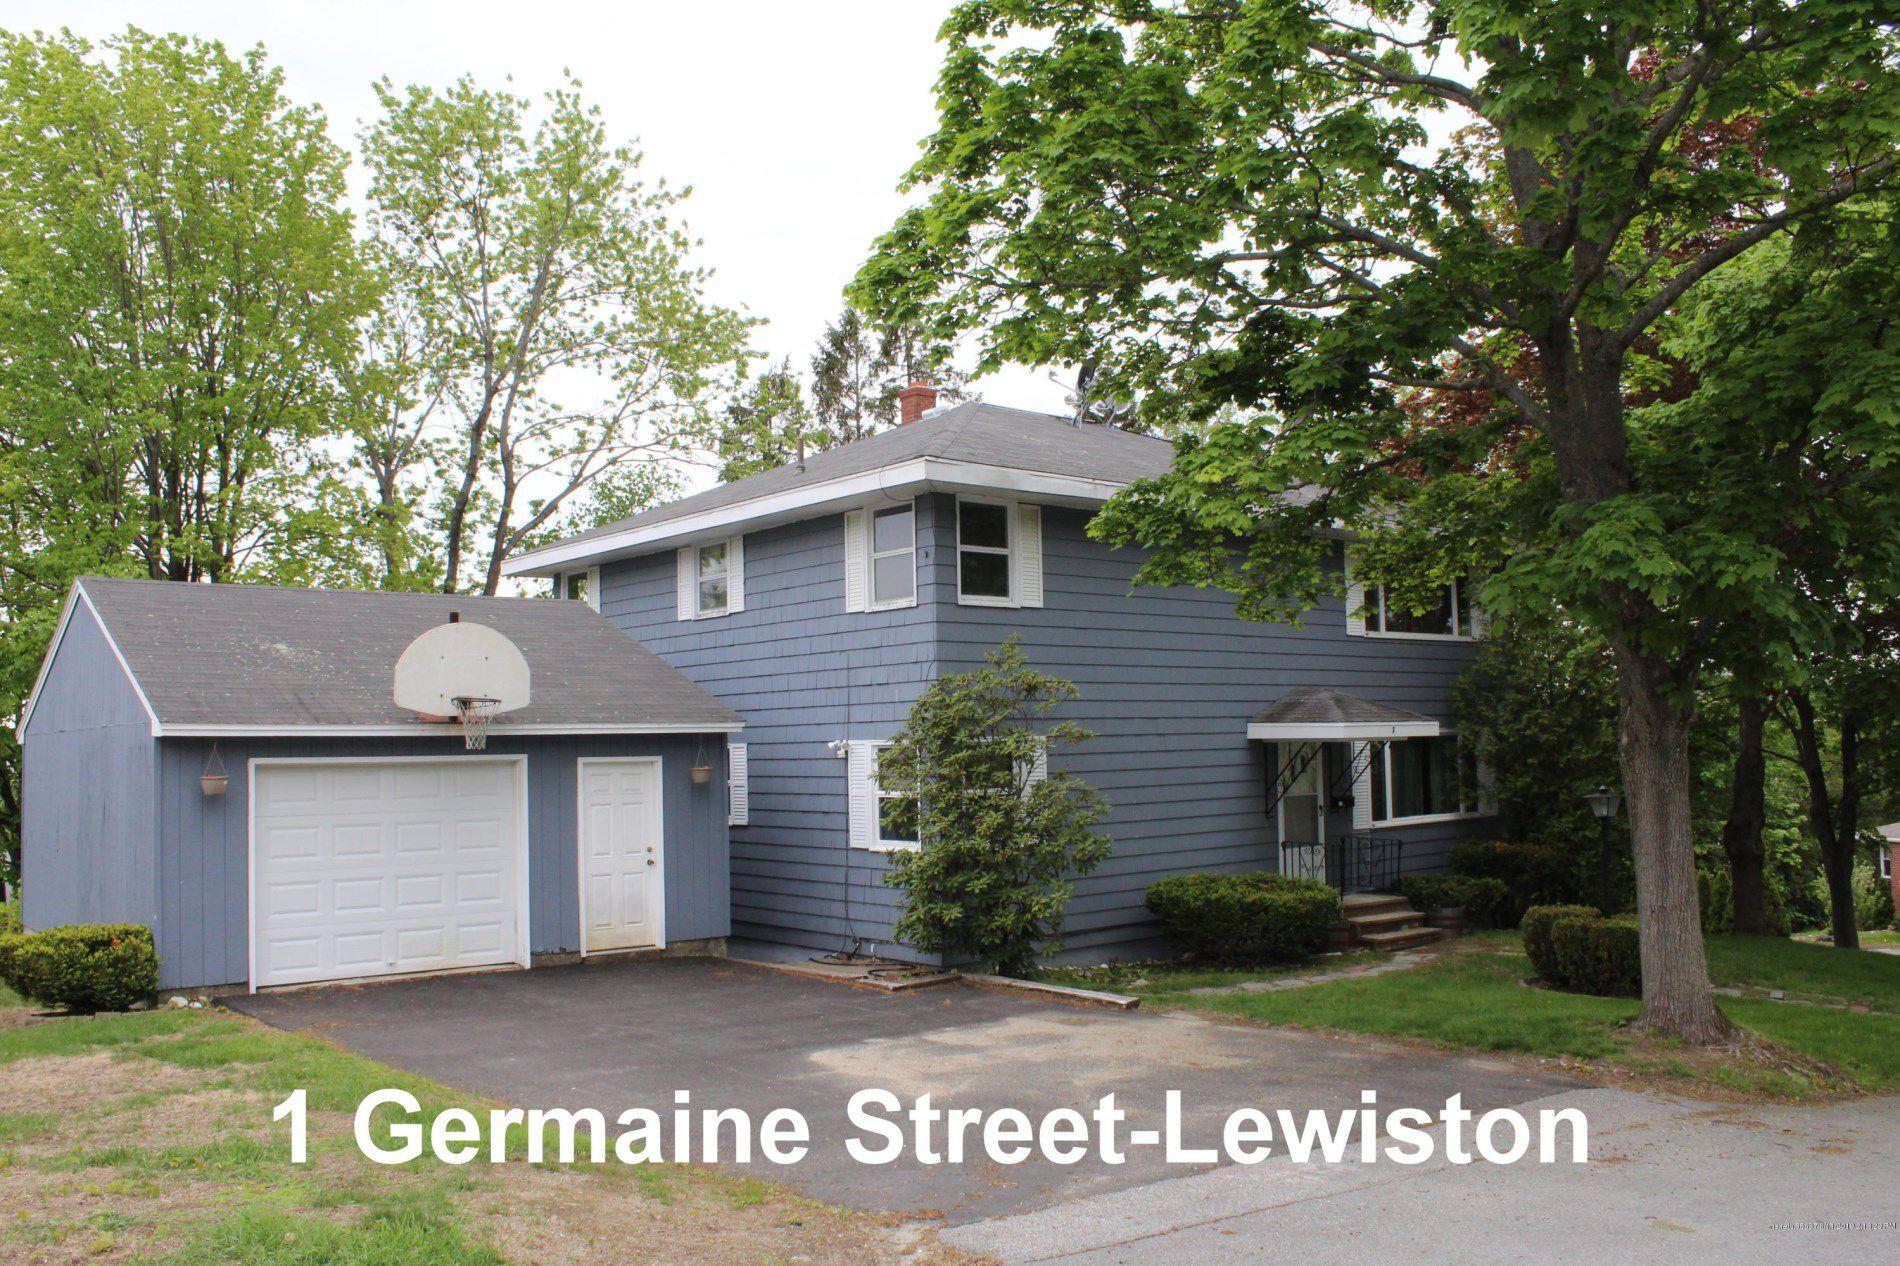 1 Germaine St, Lewiston, ME 04240 - 5 Bed, 3 Bath Multi-Family Home